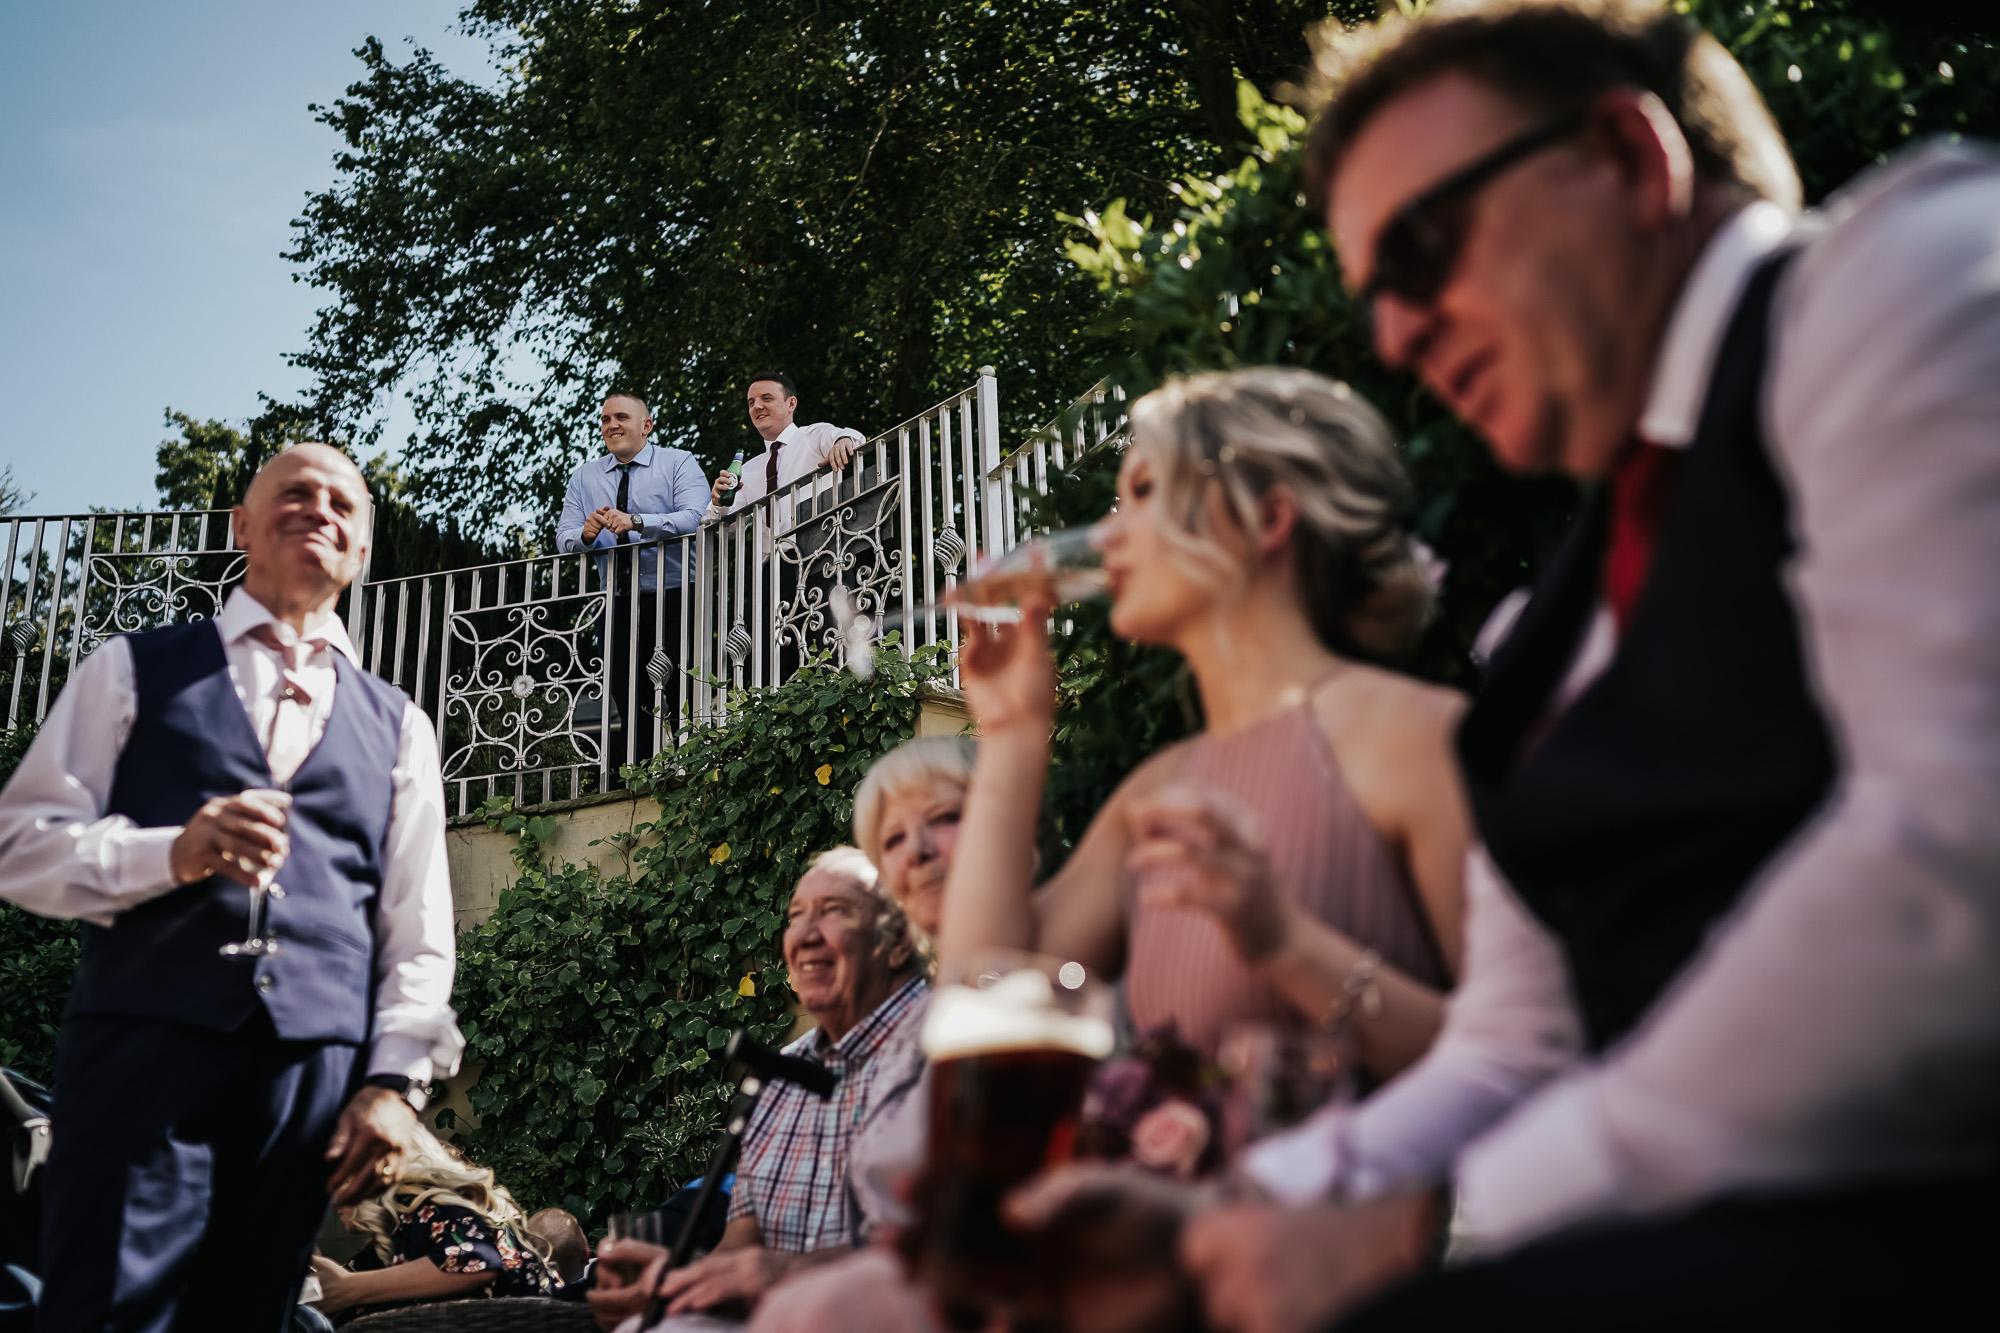 West Tower Wedding Venue Orkskirk Lancashire Wedding Photography cheshire wedding photographer (21 of 47).jpg